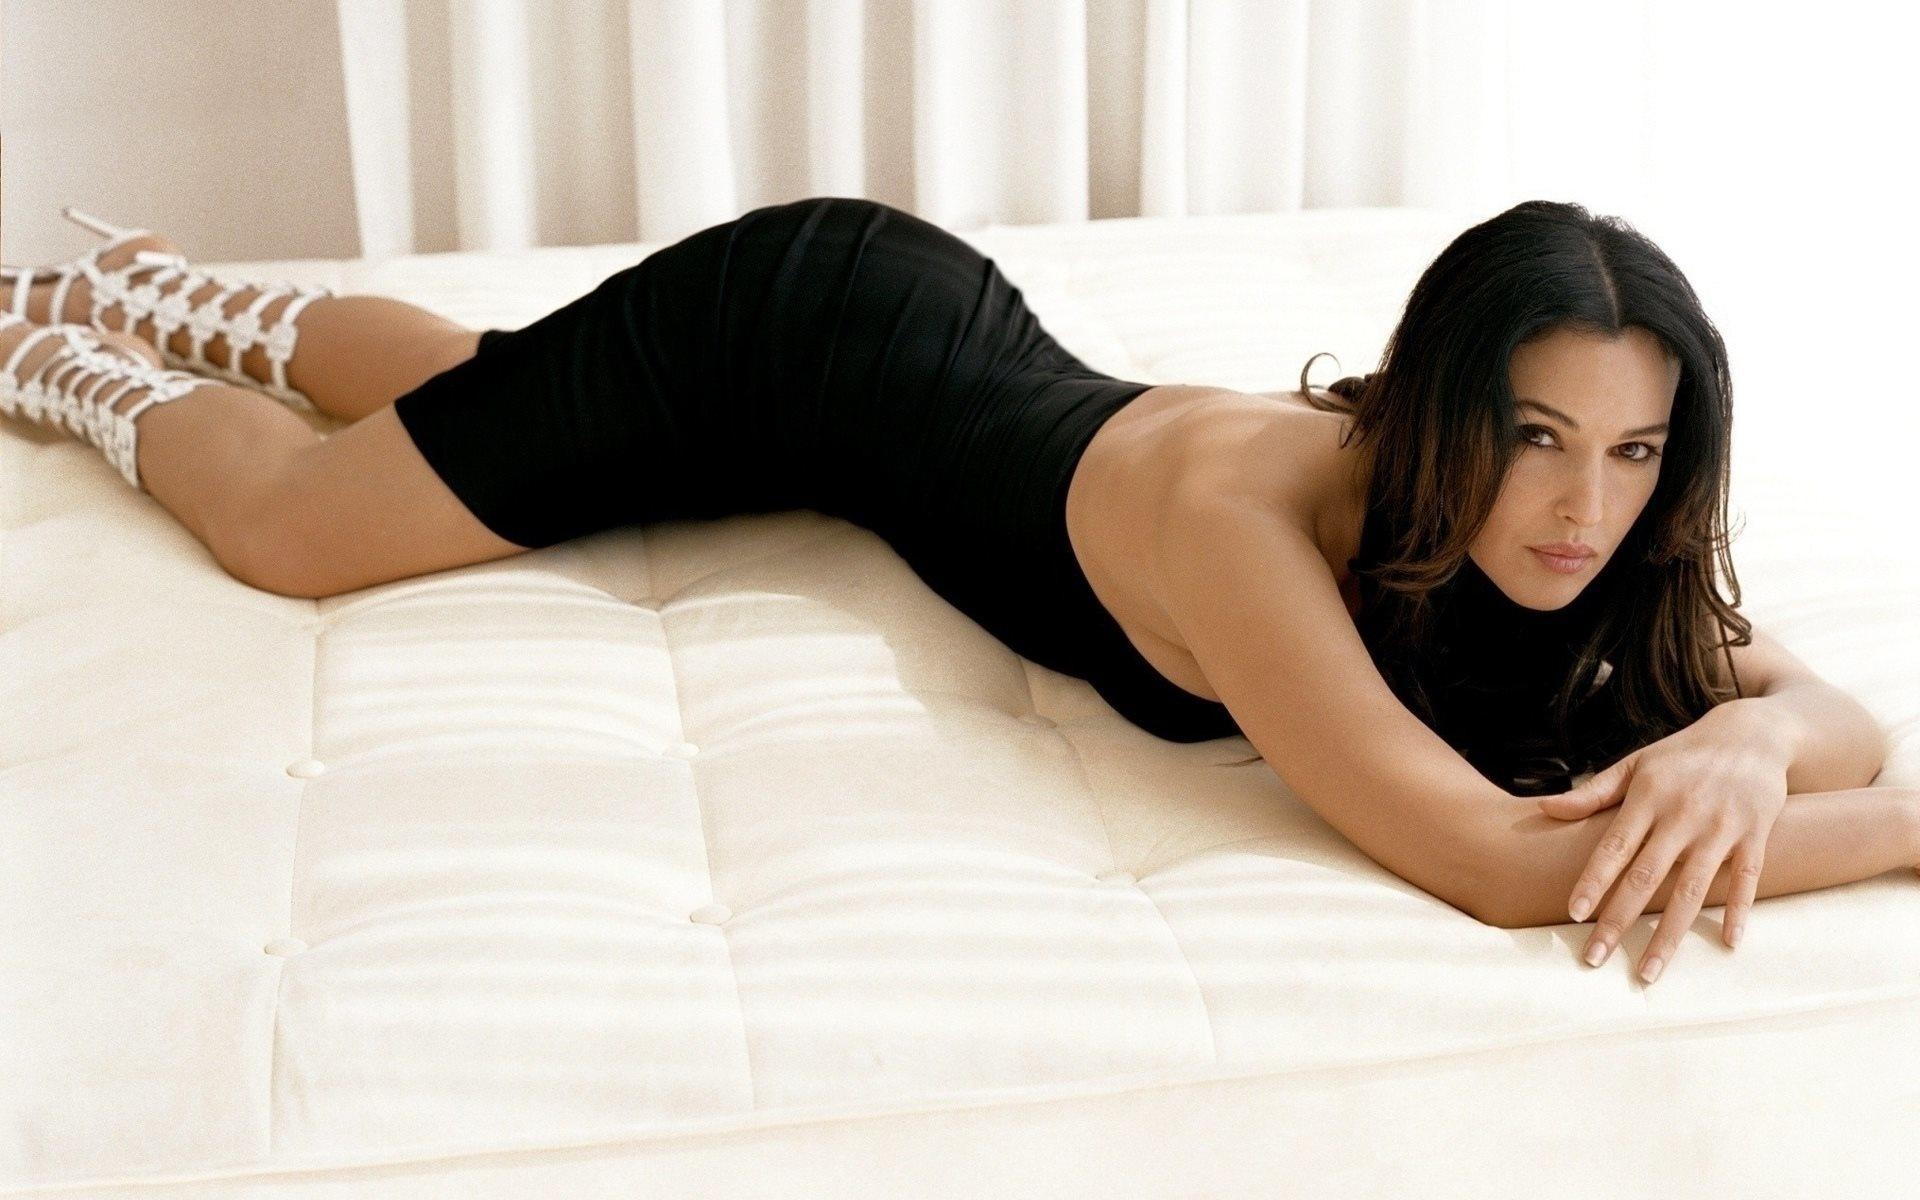 sikayut-video-porno-zvezd-monika-kovet-na-telefon-konchil-rot